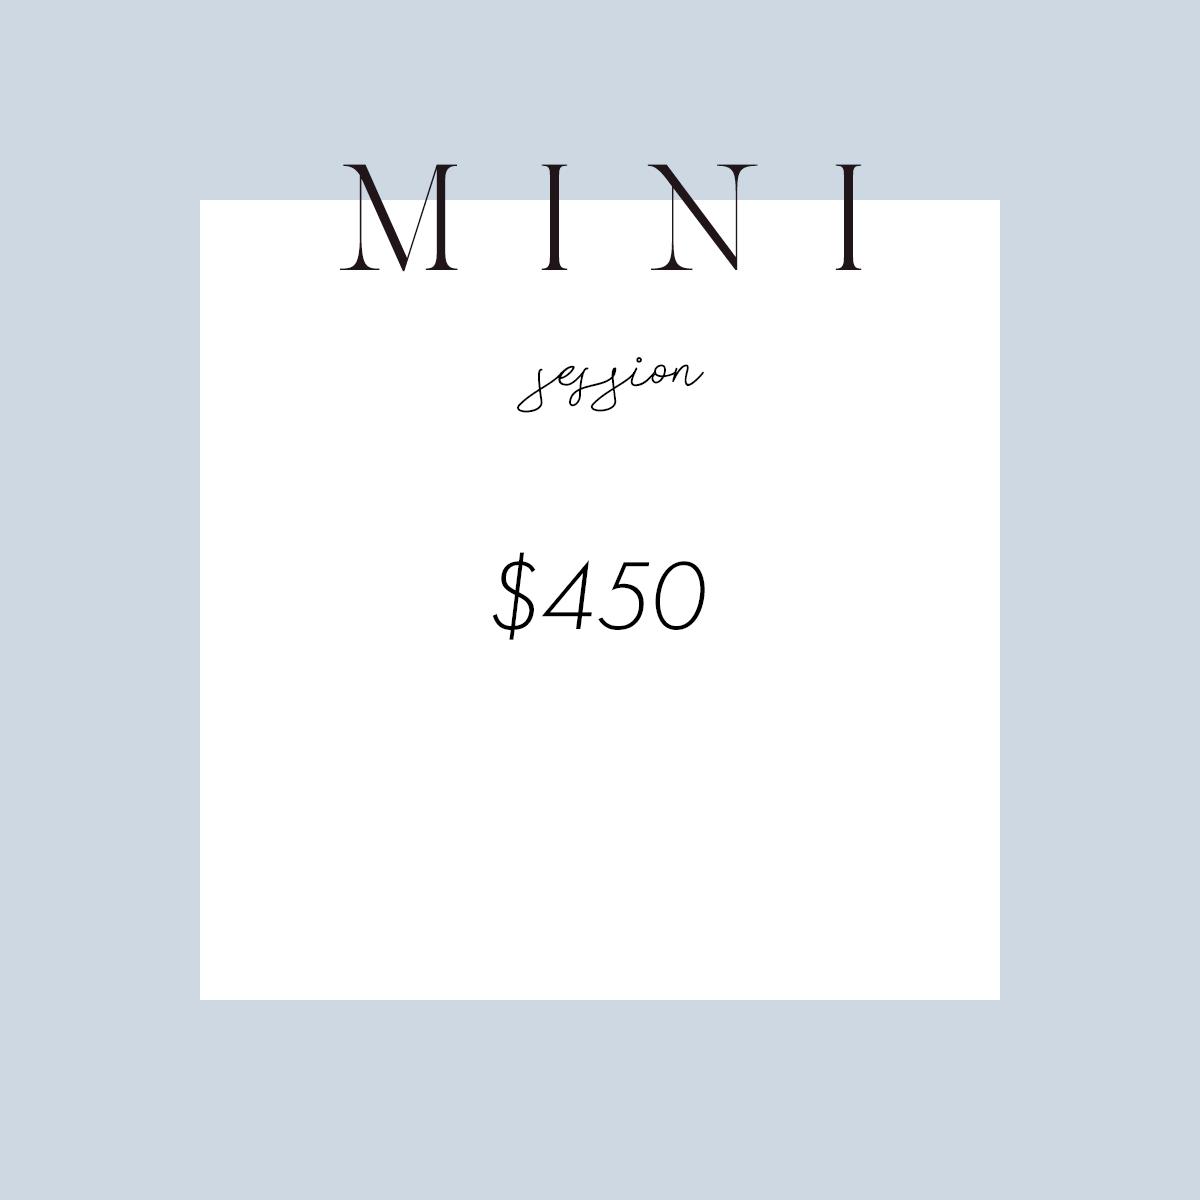 mini session price picture.jpg